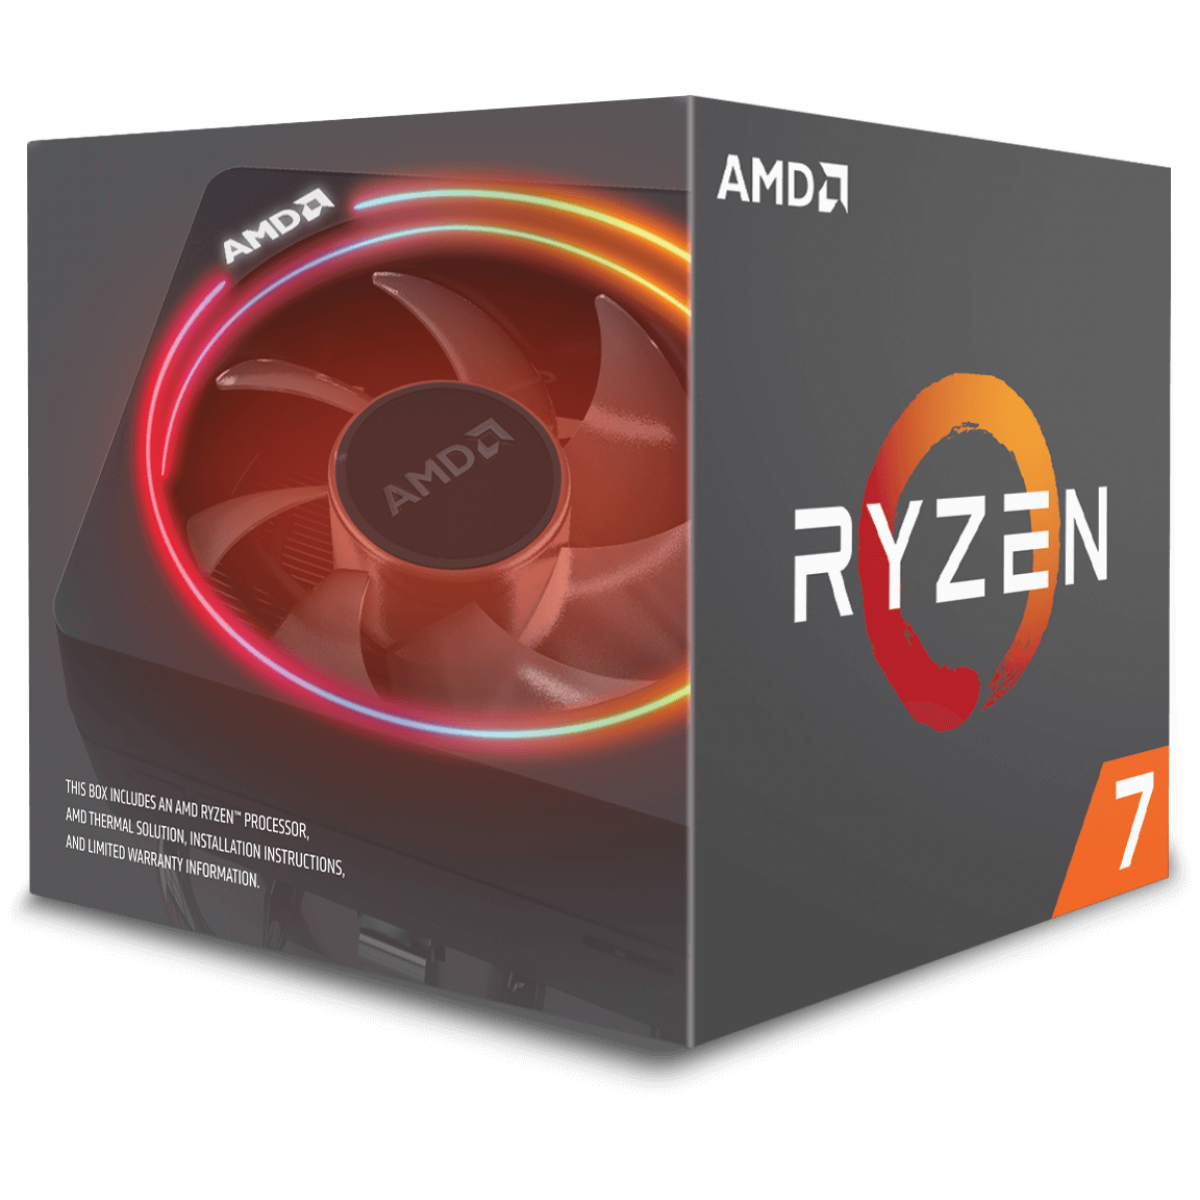 Processador AMD Ryzen 7 2700X 3.7GHz (4.3GHz Turbo), 8-Cores 16-Threads, Cooler Wraith Prism RGB, AM4, YD270XBGAFBOX, S/ Video